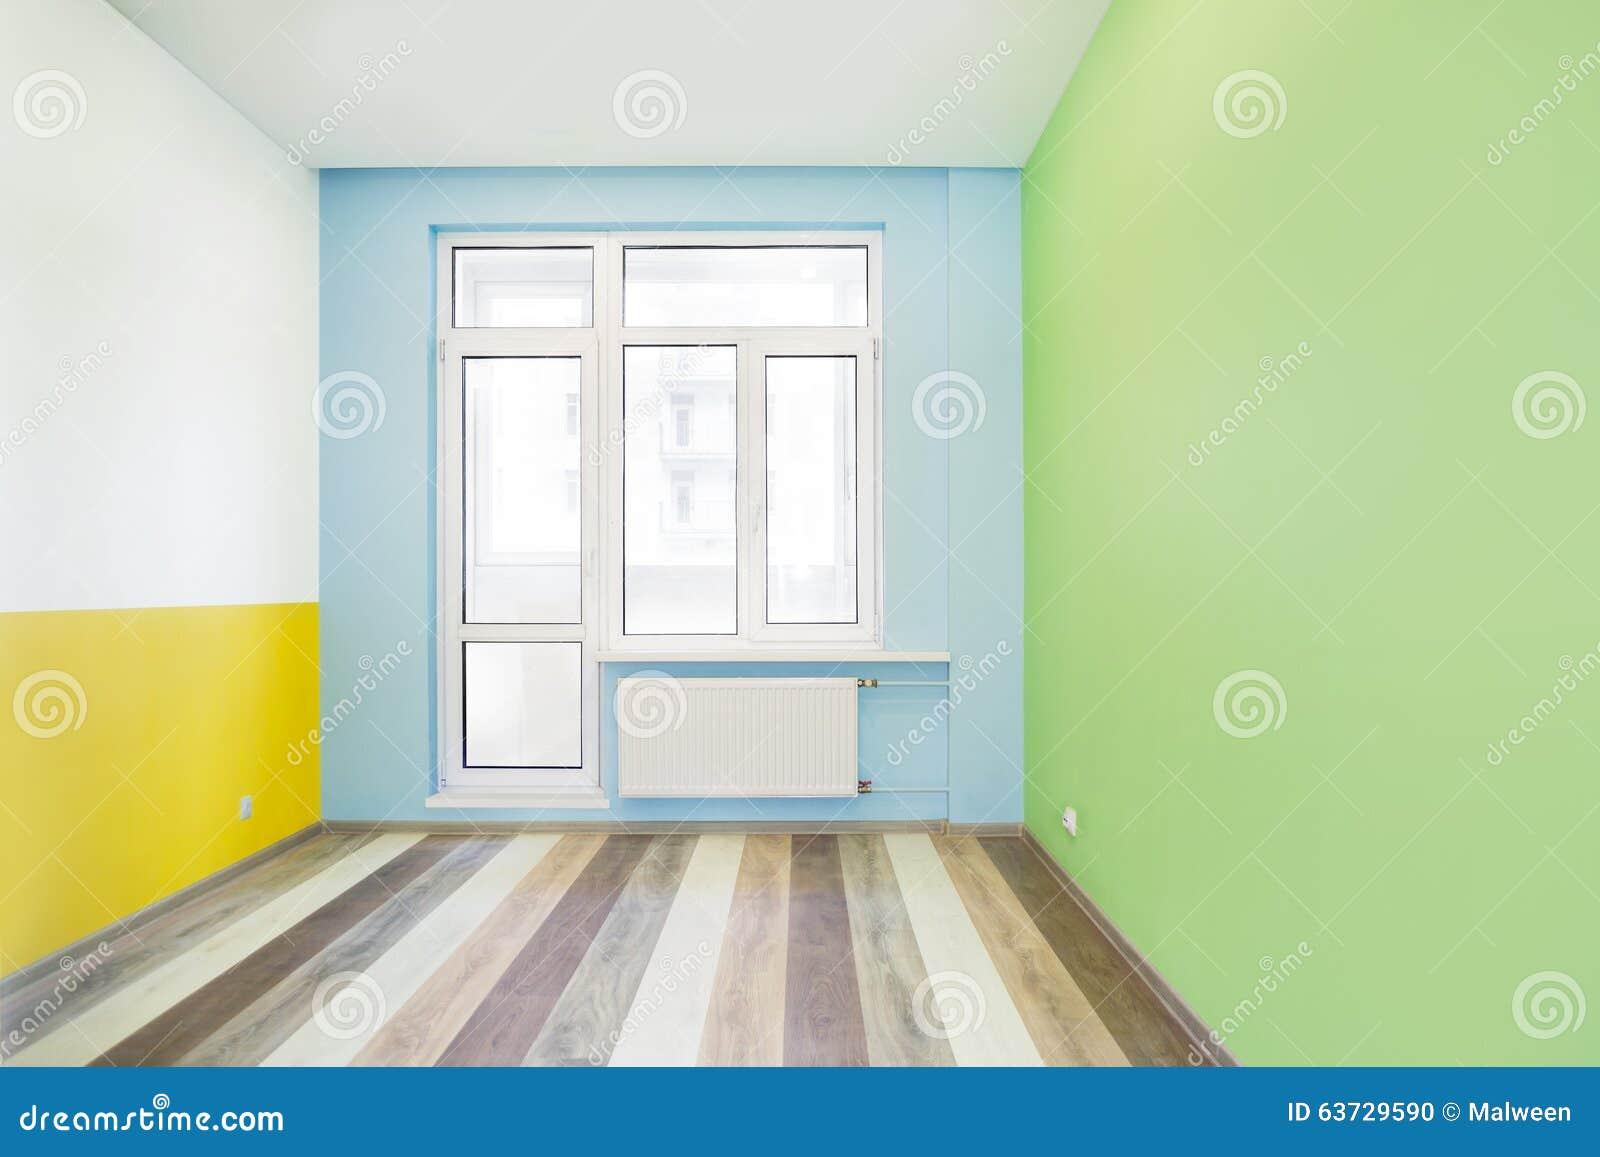 Bright Blue Empty Room